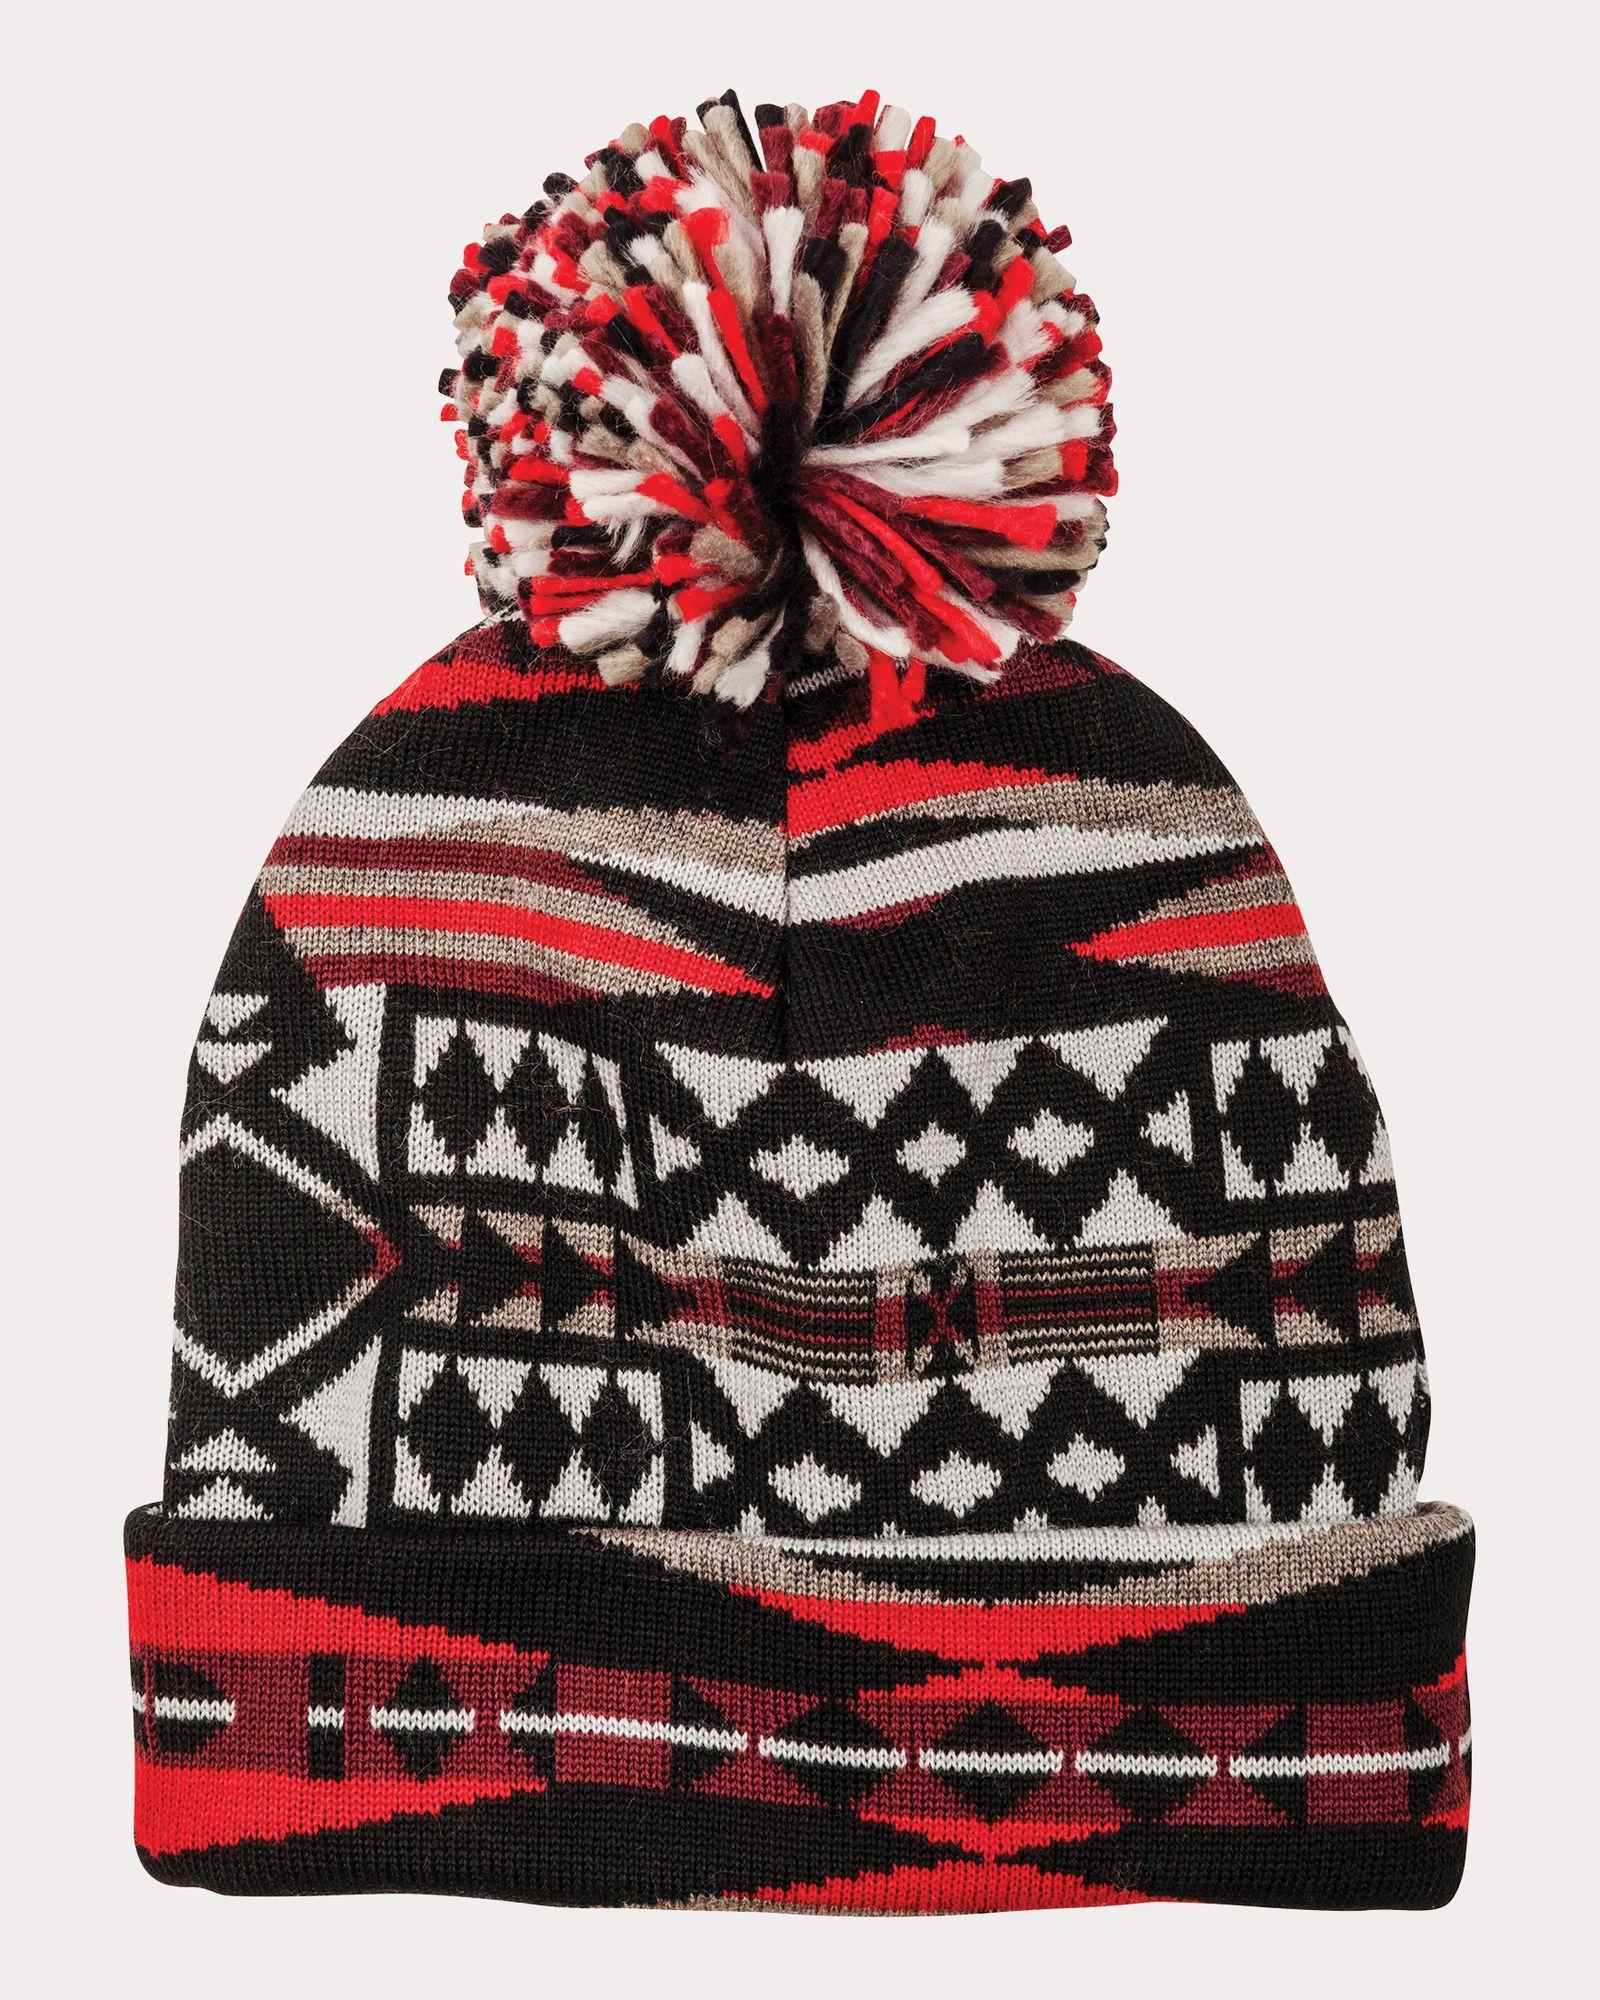 Scarlet La Paz Pom Pom Beanie - Pendleton Woolen MIlls - Apparel    Accessories - National Cowboy Museum 5ff04762f0a